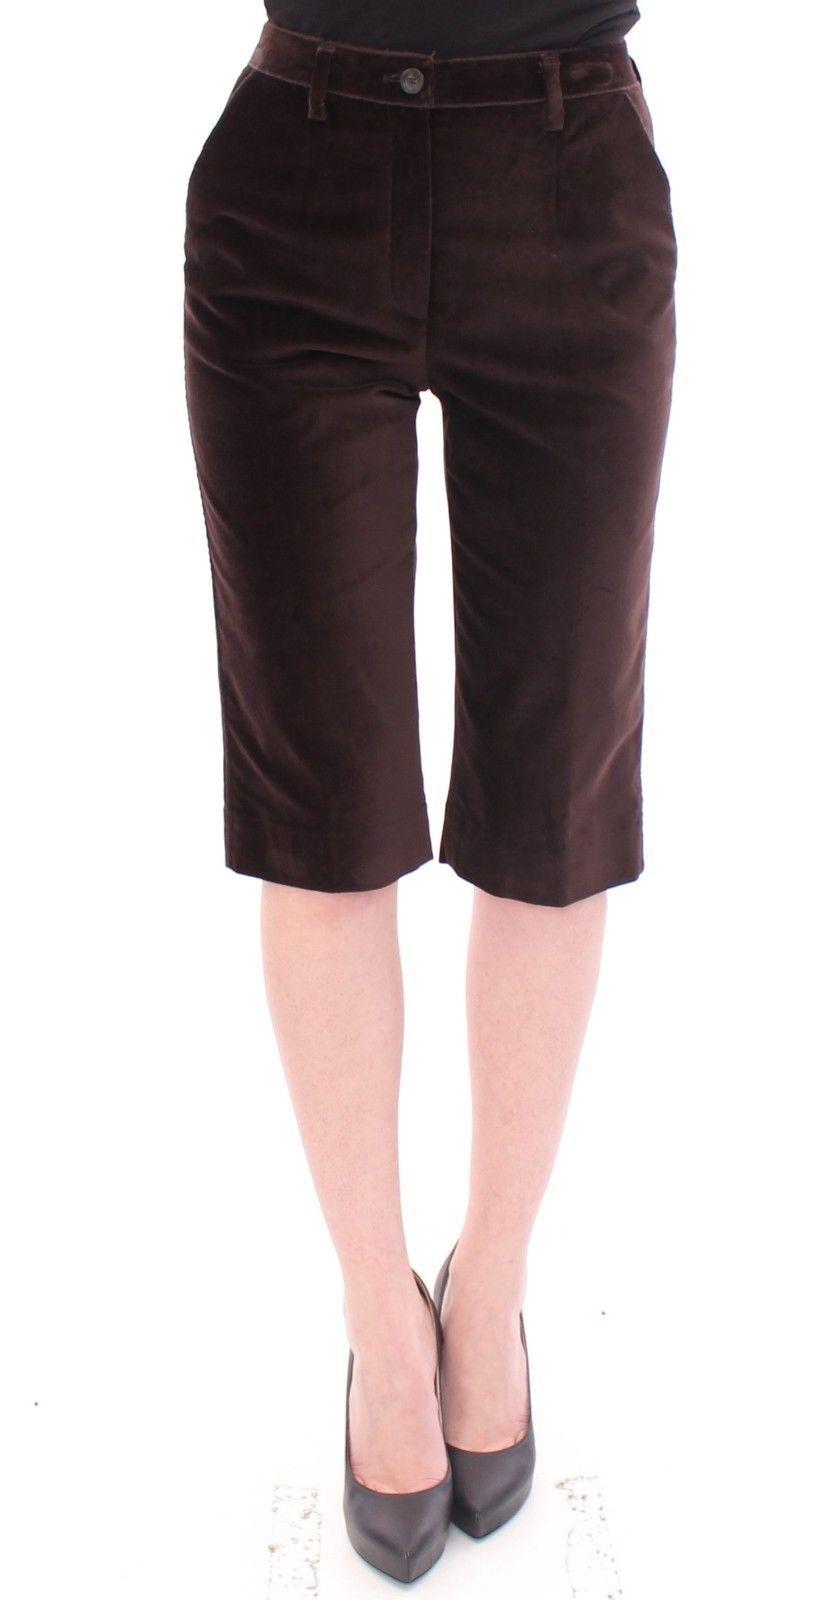 Dolce & Gabbana Women's Cotton Solid Pattern Shorts Brown GSS10076 - IT36